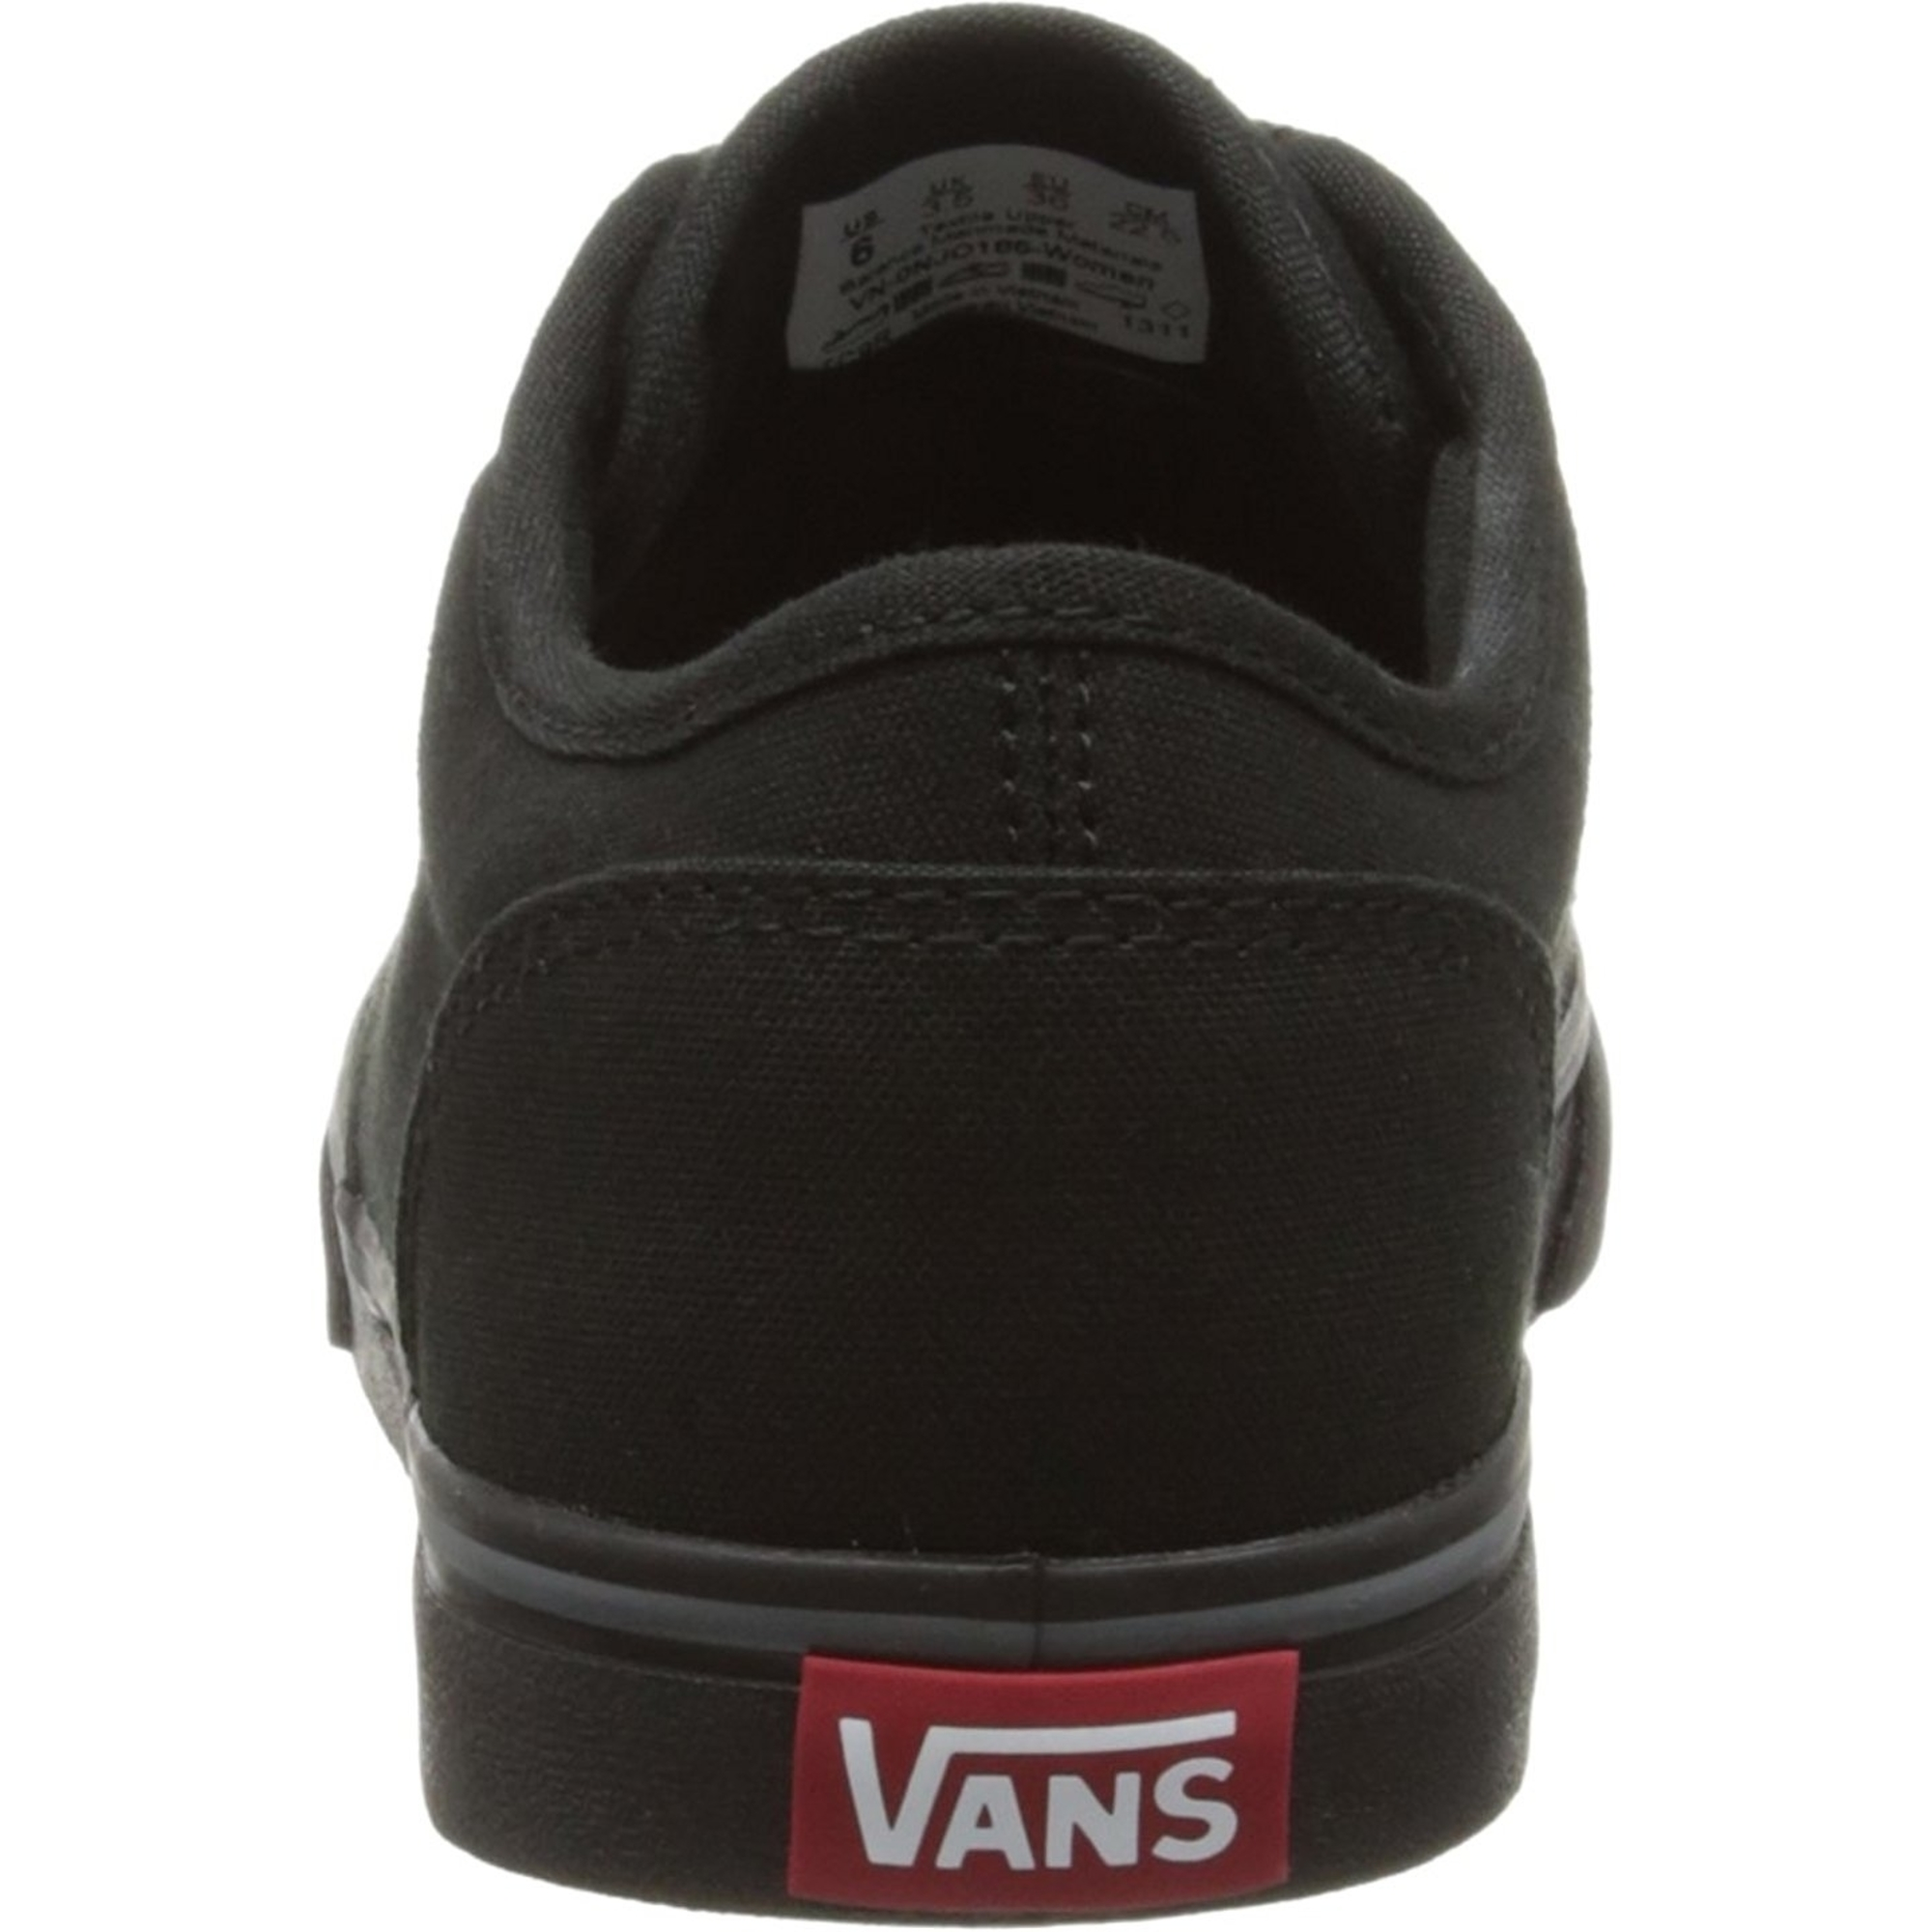 Vans Active WM Atwood Low Black Canvas Adult